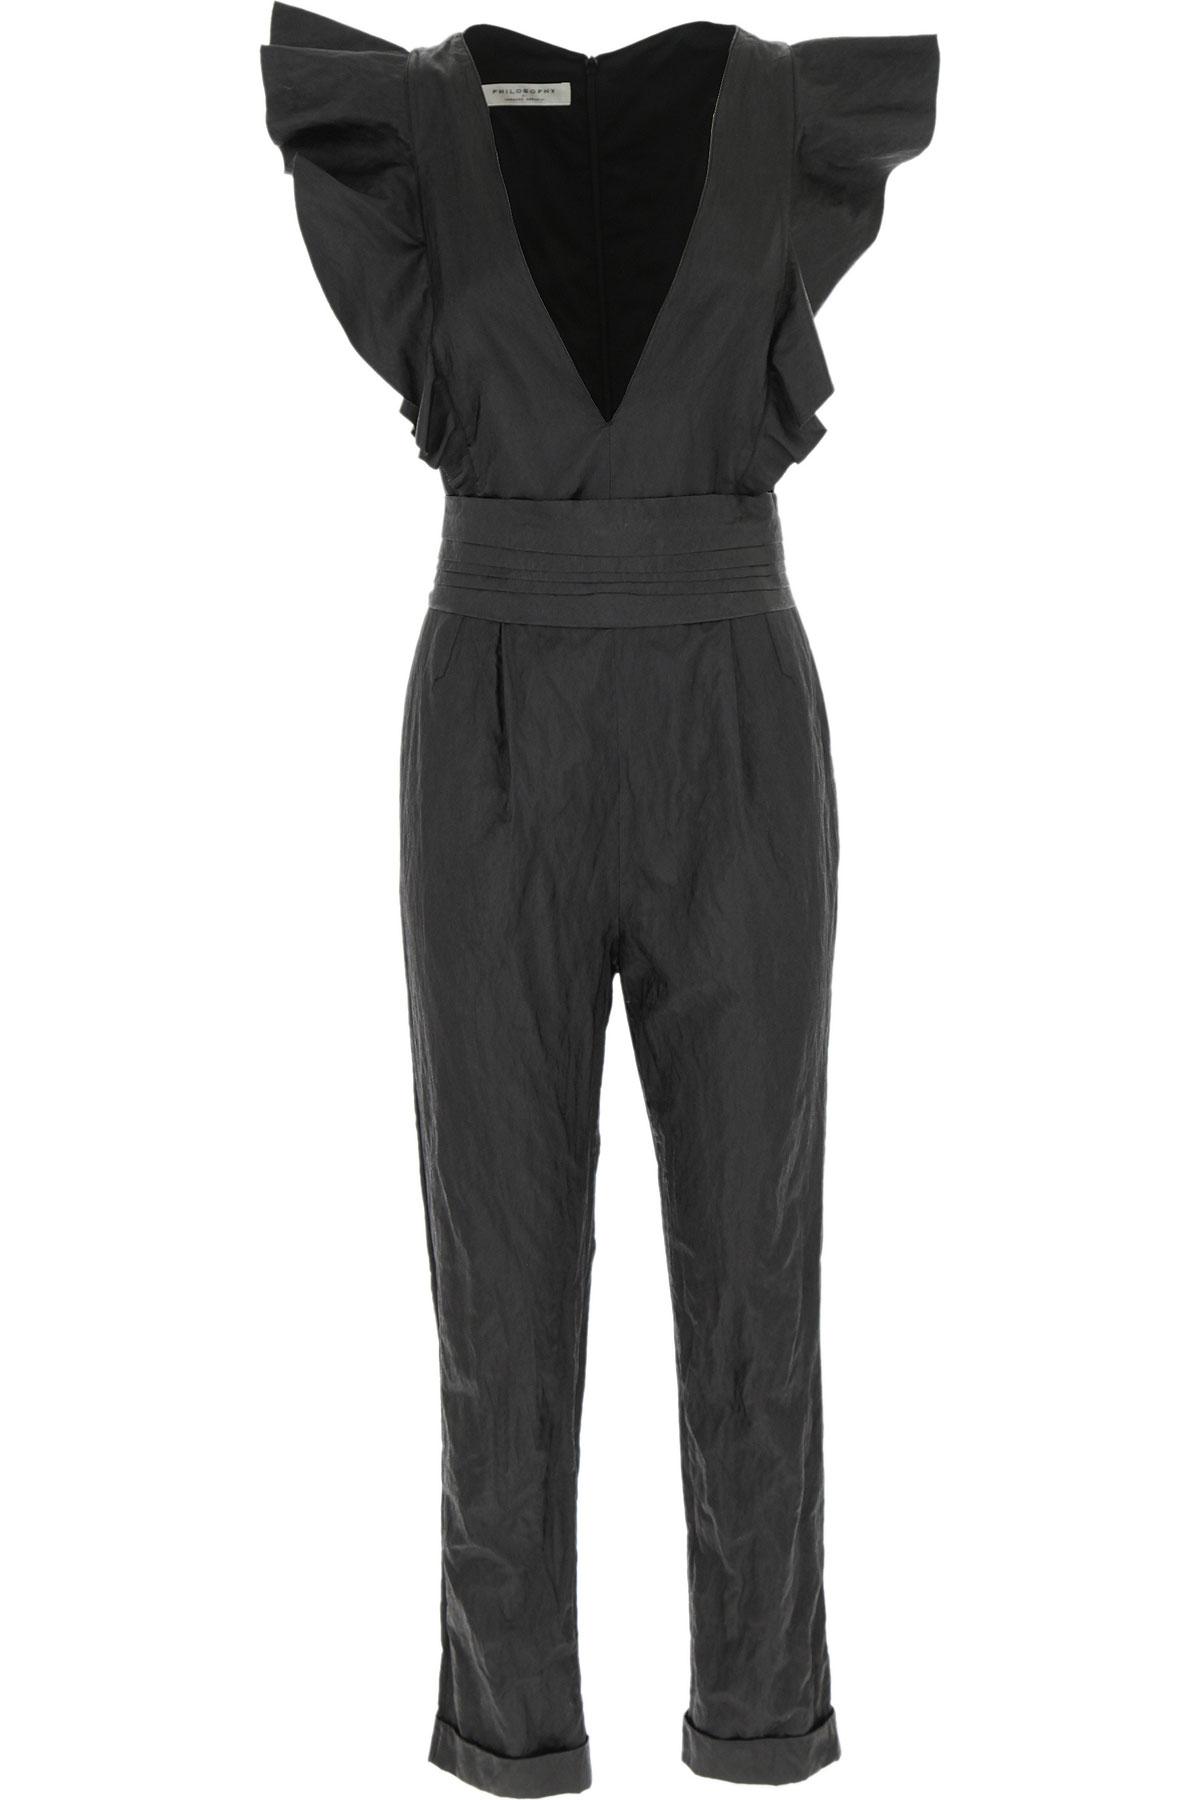 Philosophy di Lorenzo Serafini Dress for Women, Evening Cocktail Party On Sale, Black, viscosa, 2019, 2 4 6